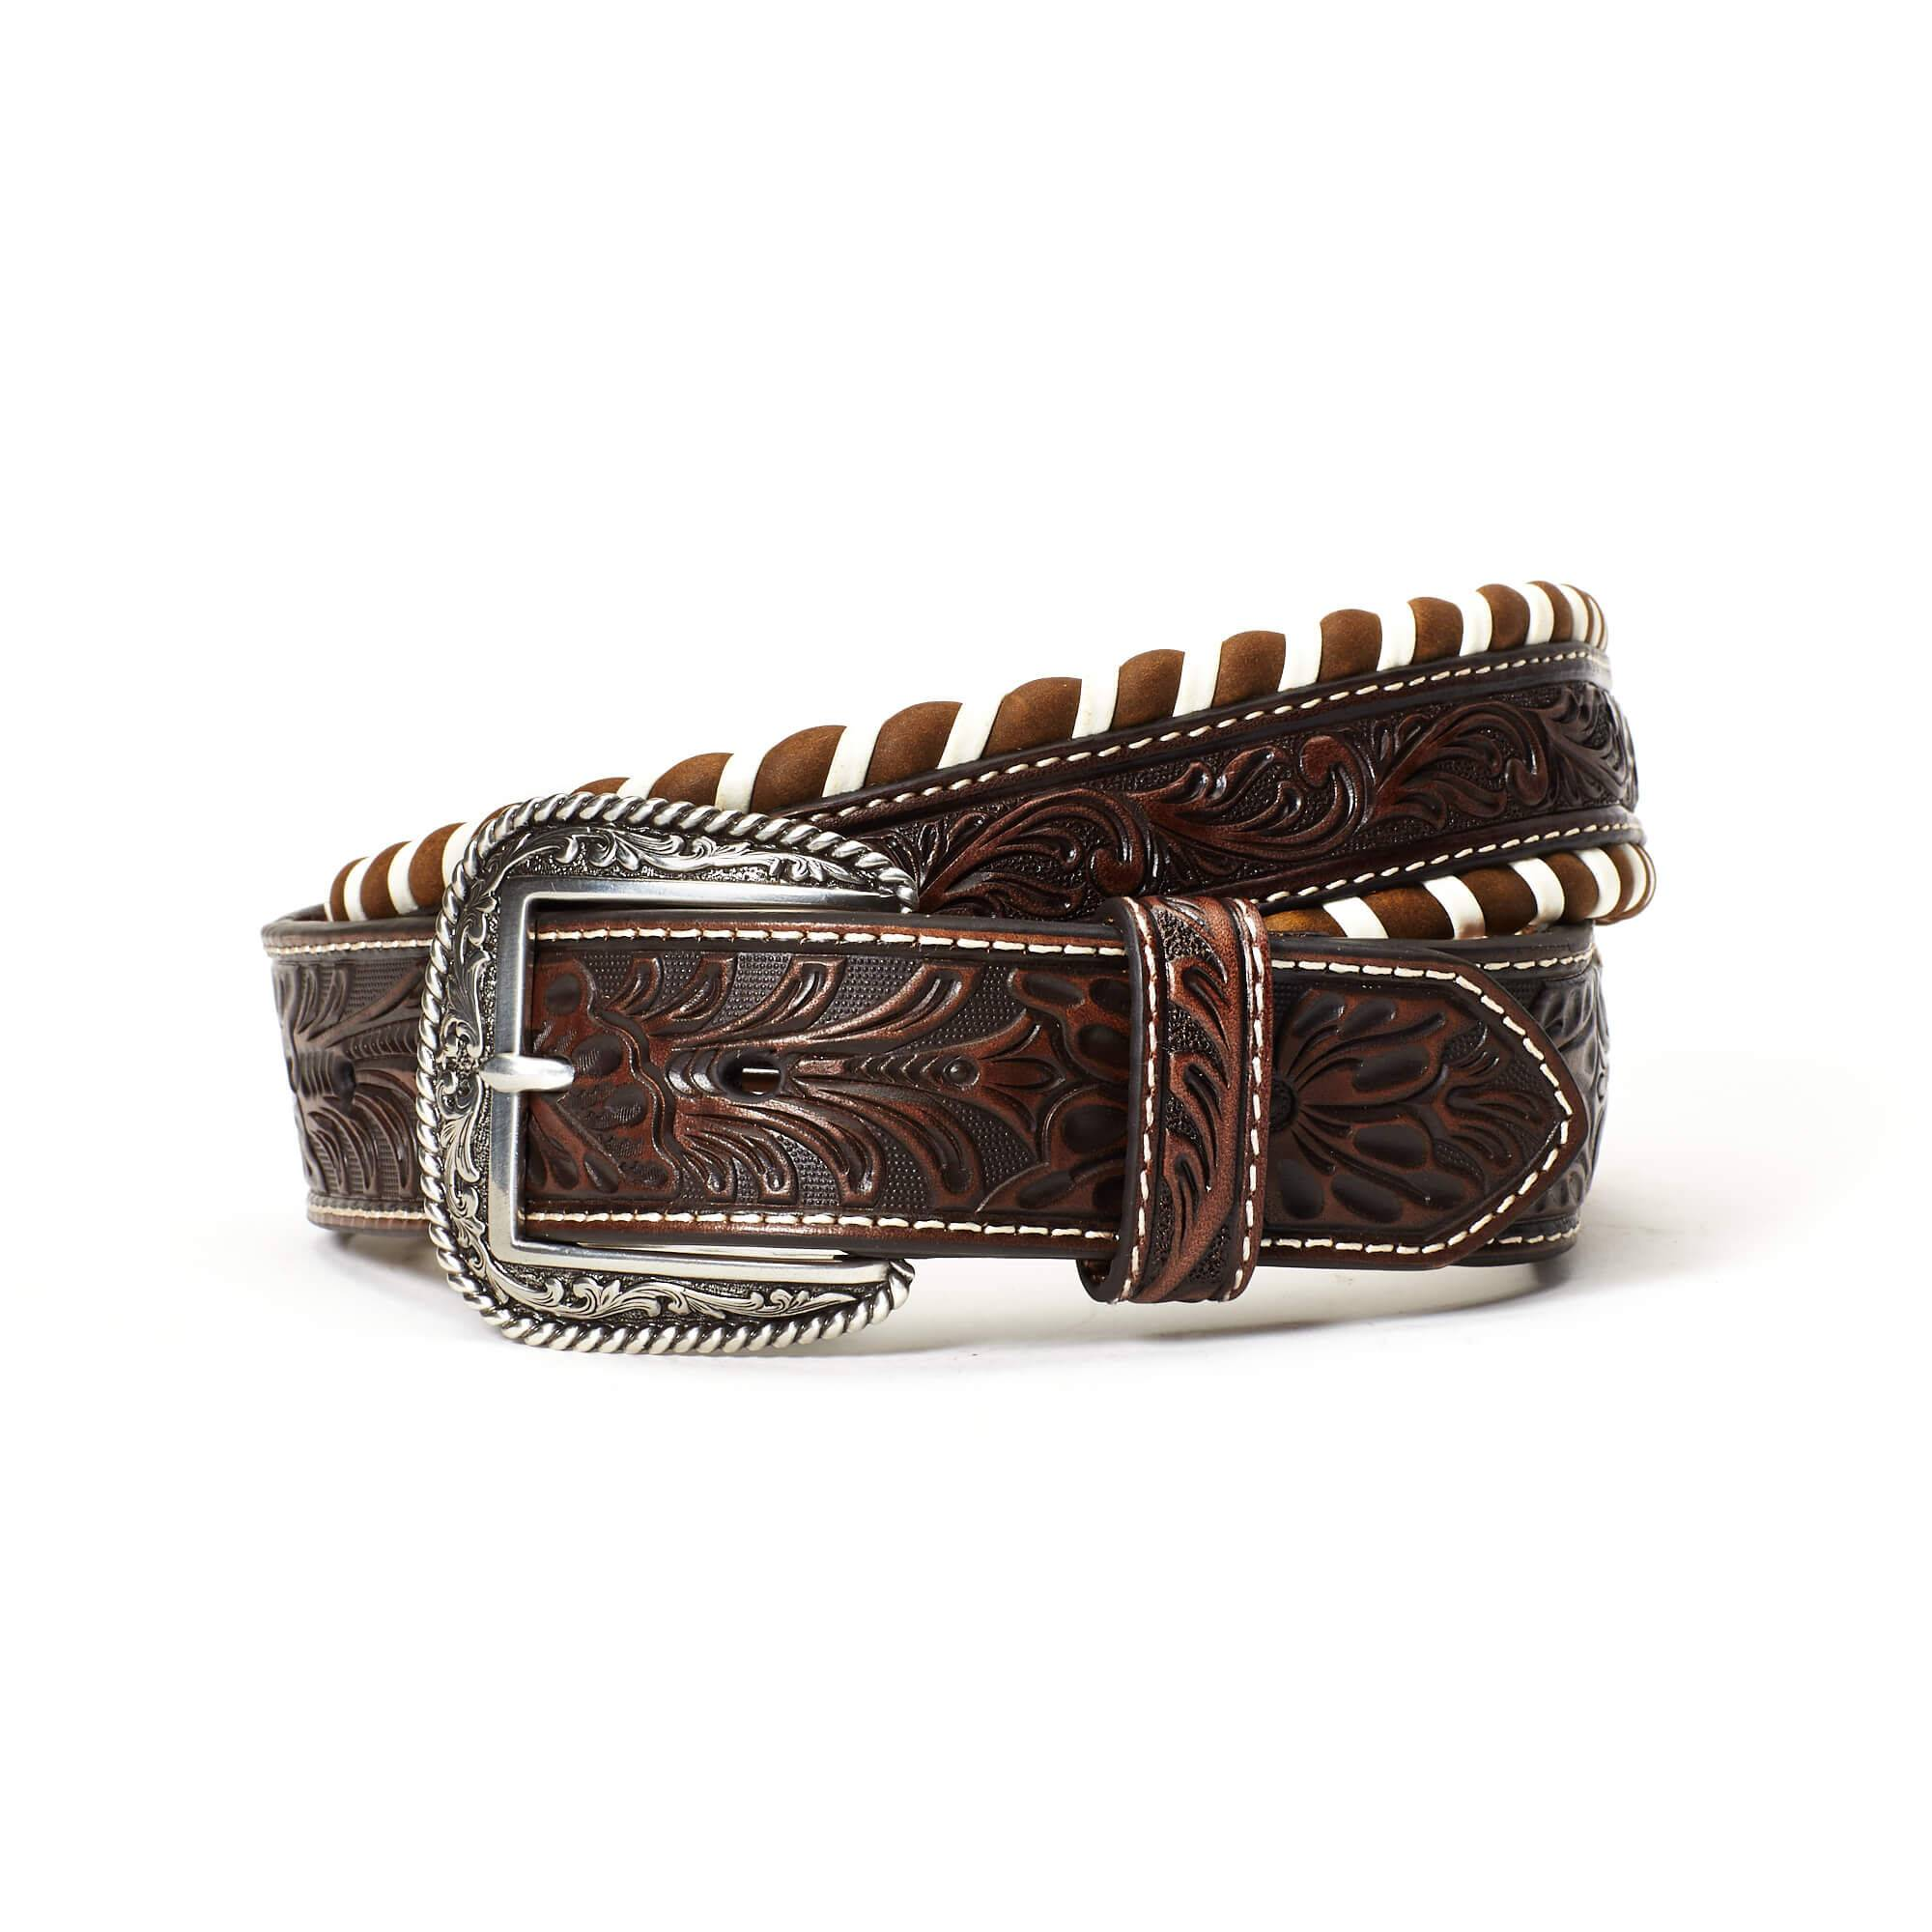 Ariat Men's Standout Belt in Brown, Size 42 by Ariat